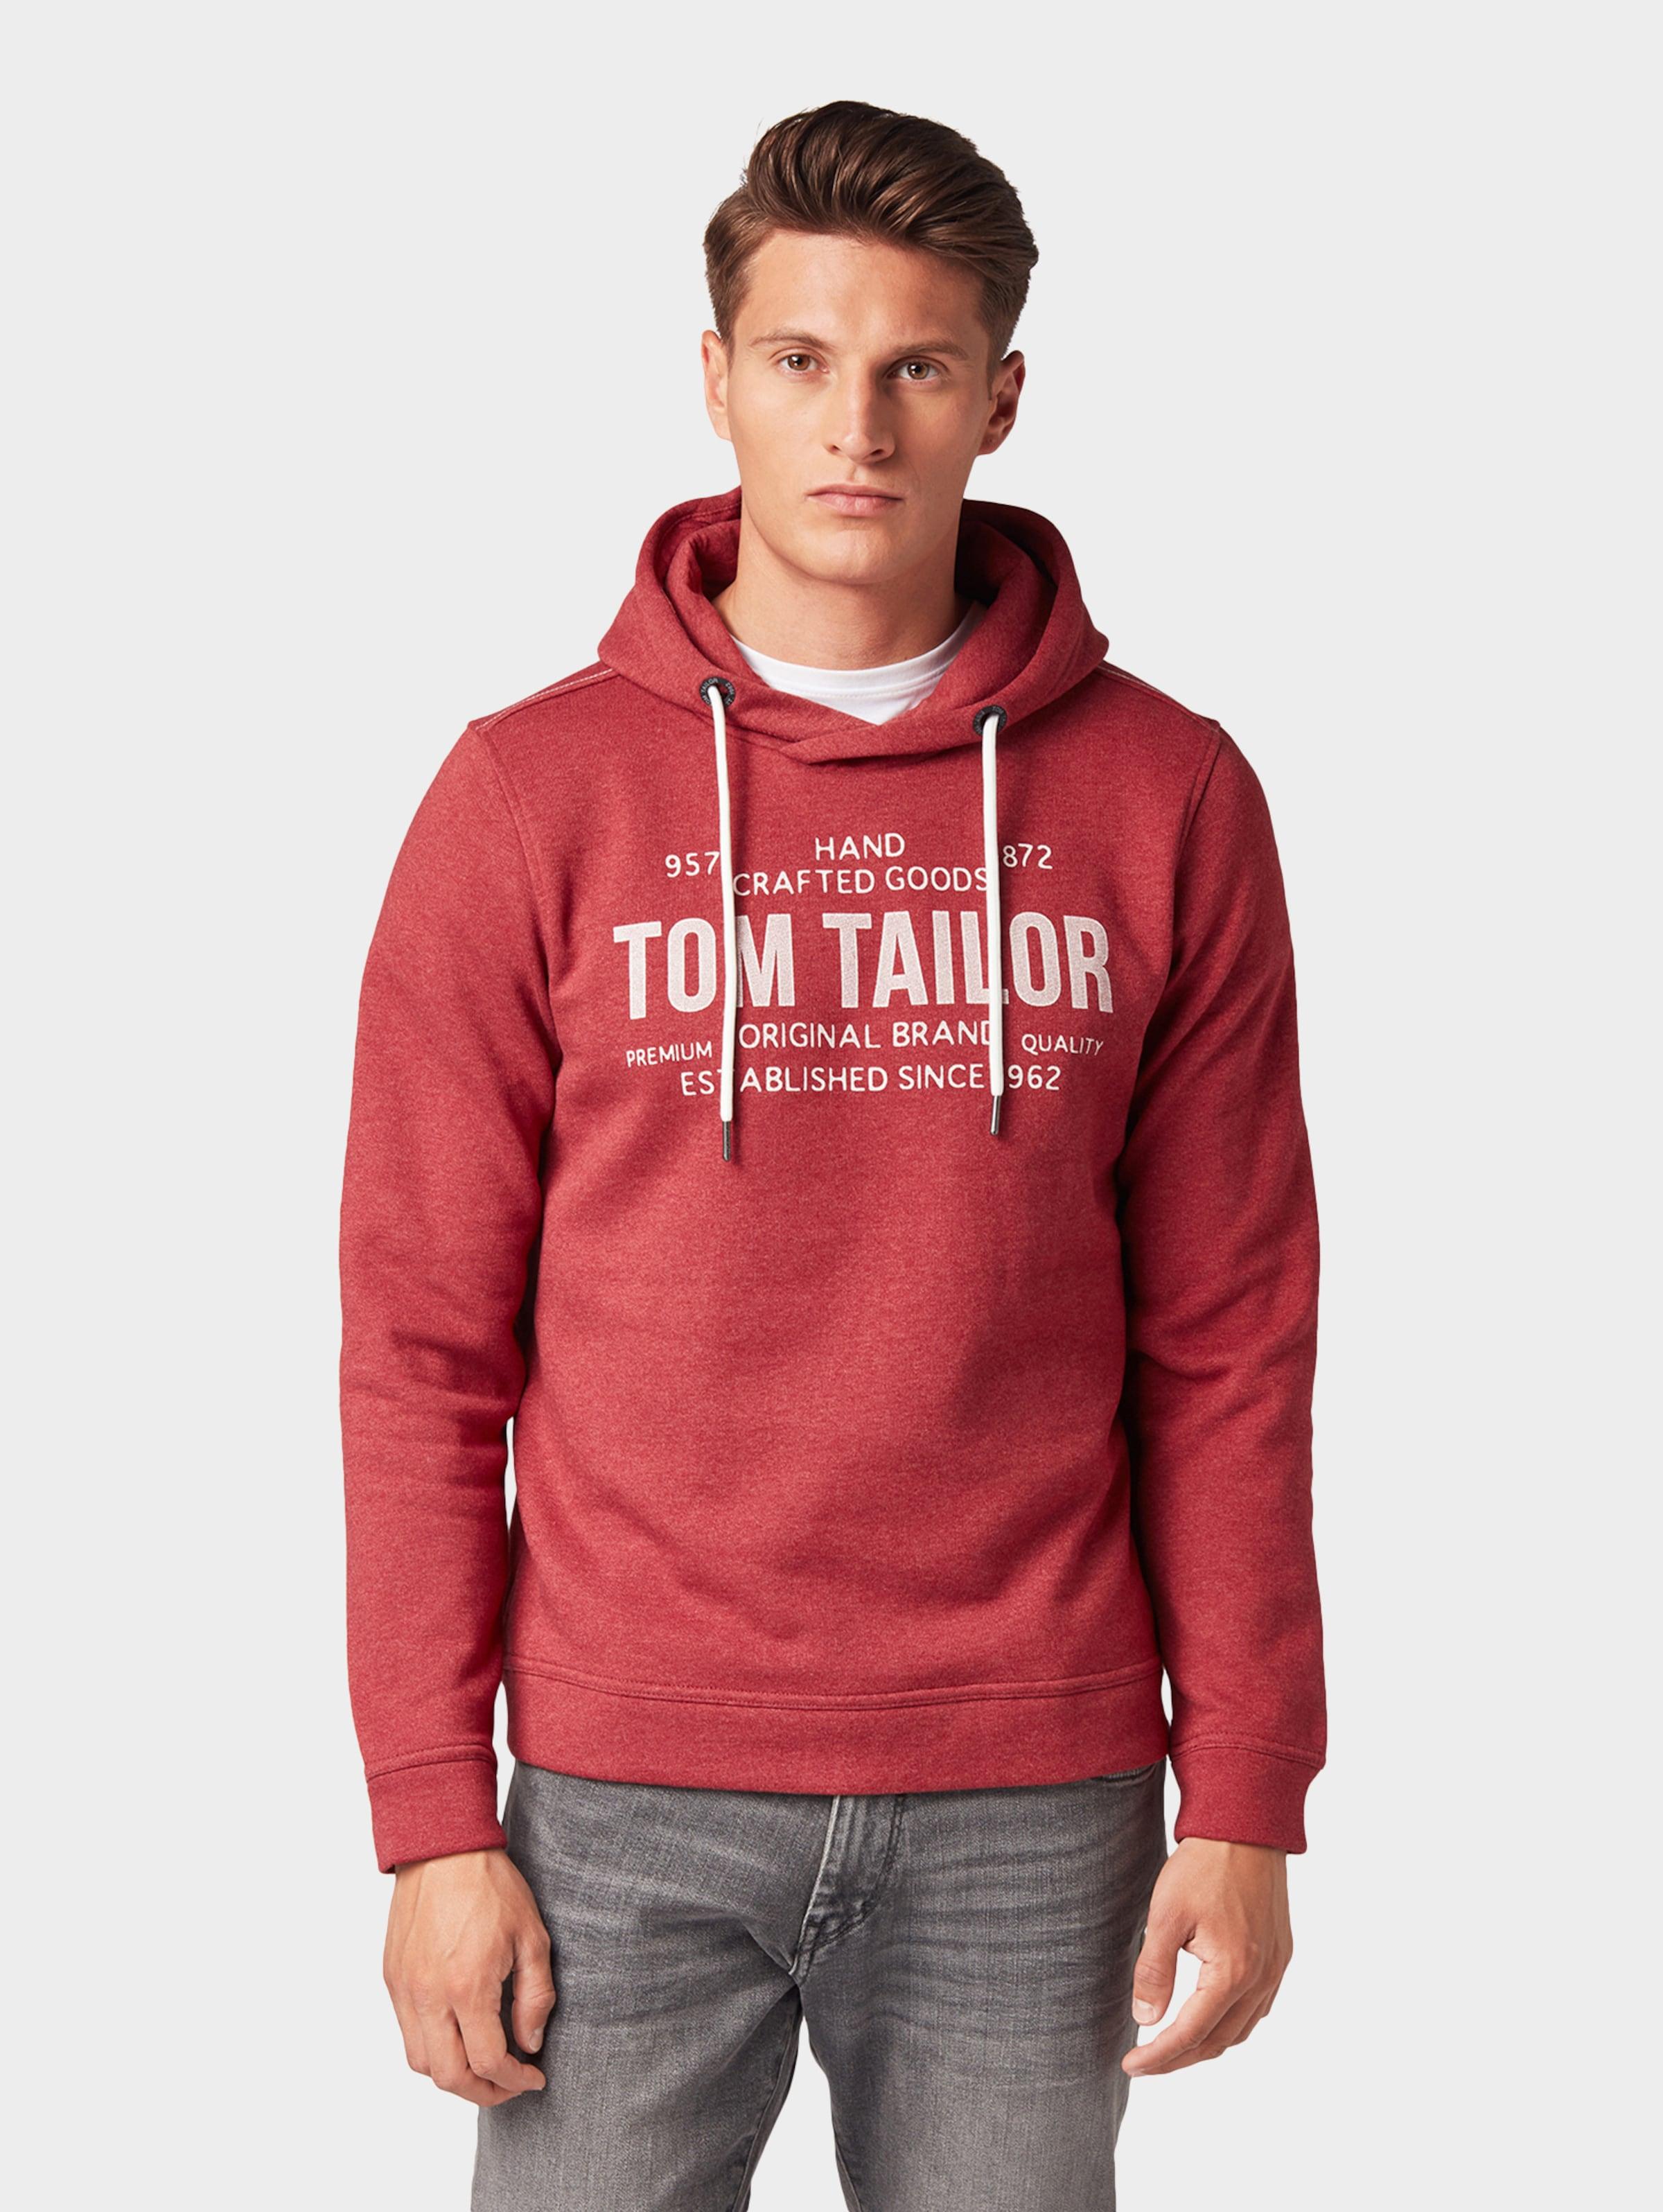 Rot Tom Hoodie In Tailor Print Mit xWBrdeCo